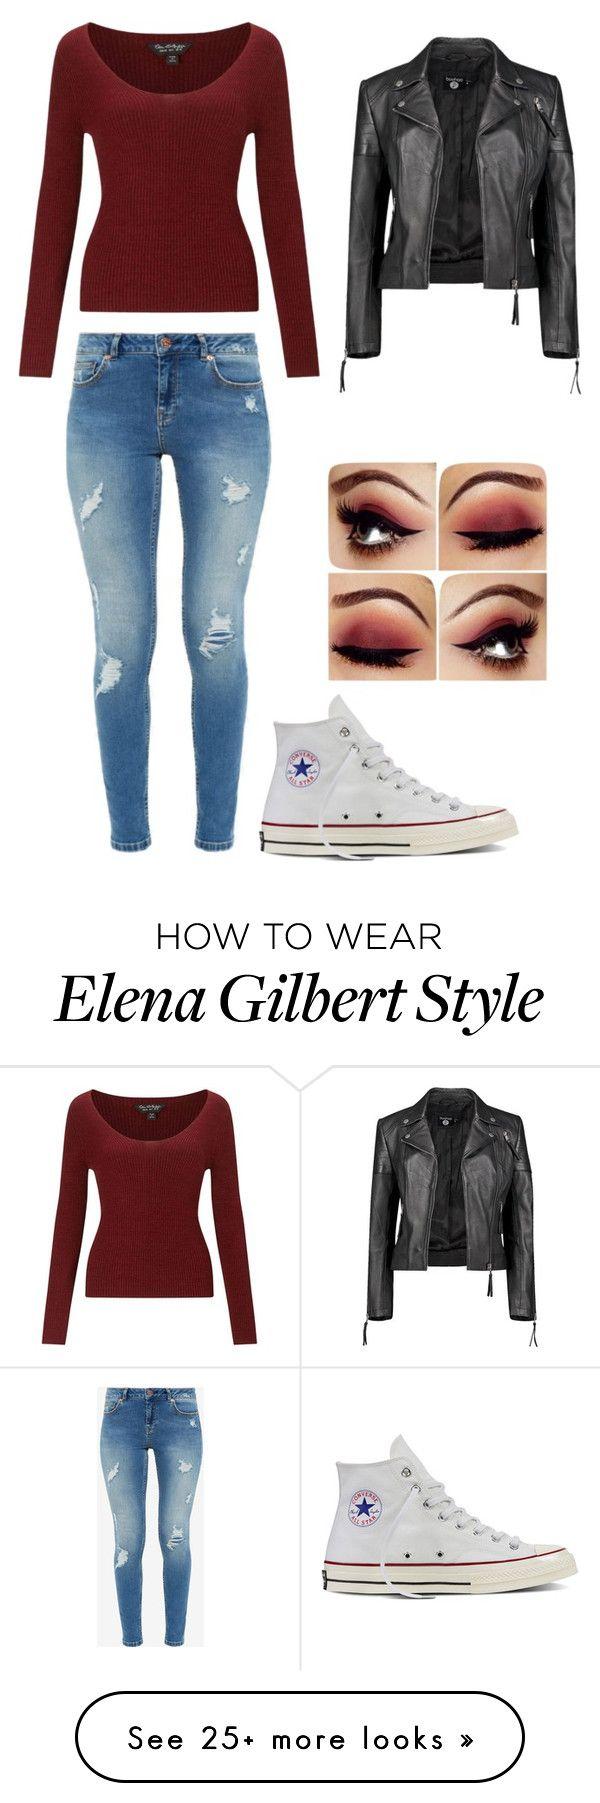 """Diy Elena Gilbert"" by hannahmarchant on Polyvore featuring Miss Selfridge, Ted Baker, Boohoo, Converse, halloweencostume and DIYHalloween"